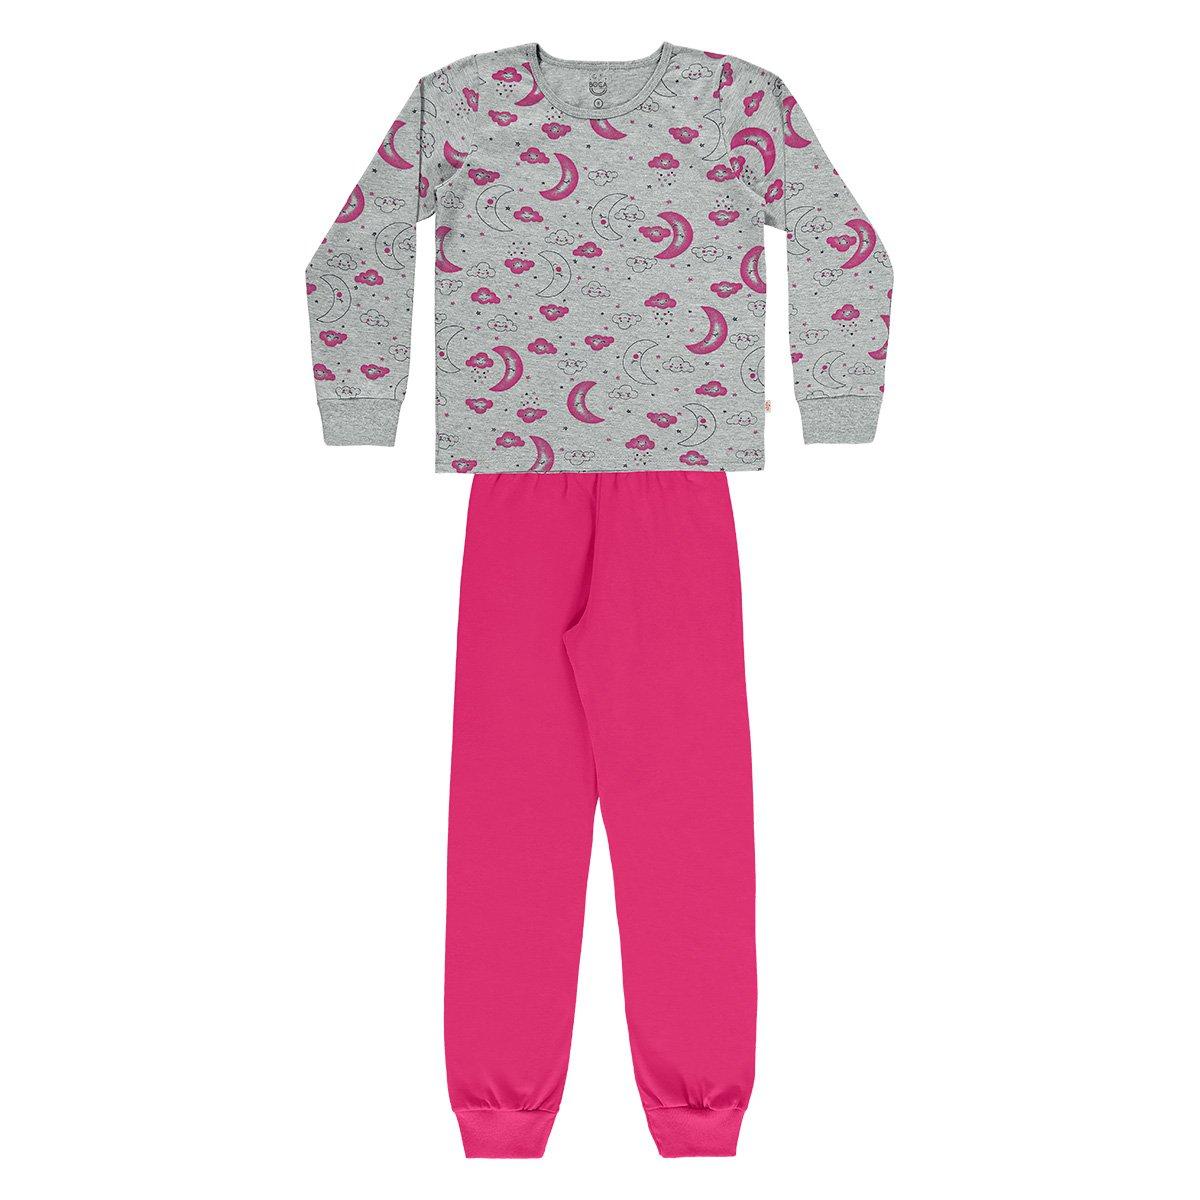 Pijama Bebê Longo Boca Grande Sonhos Feminino